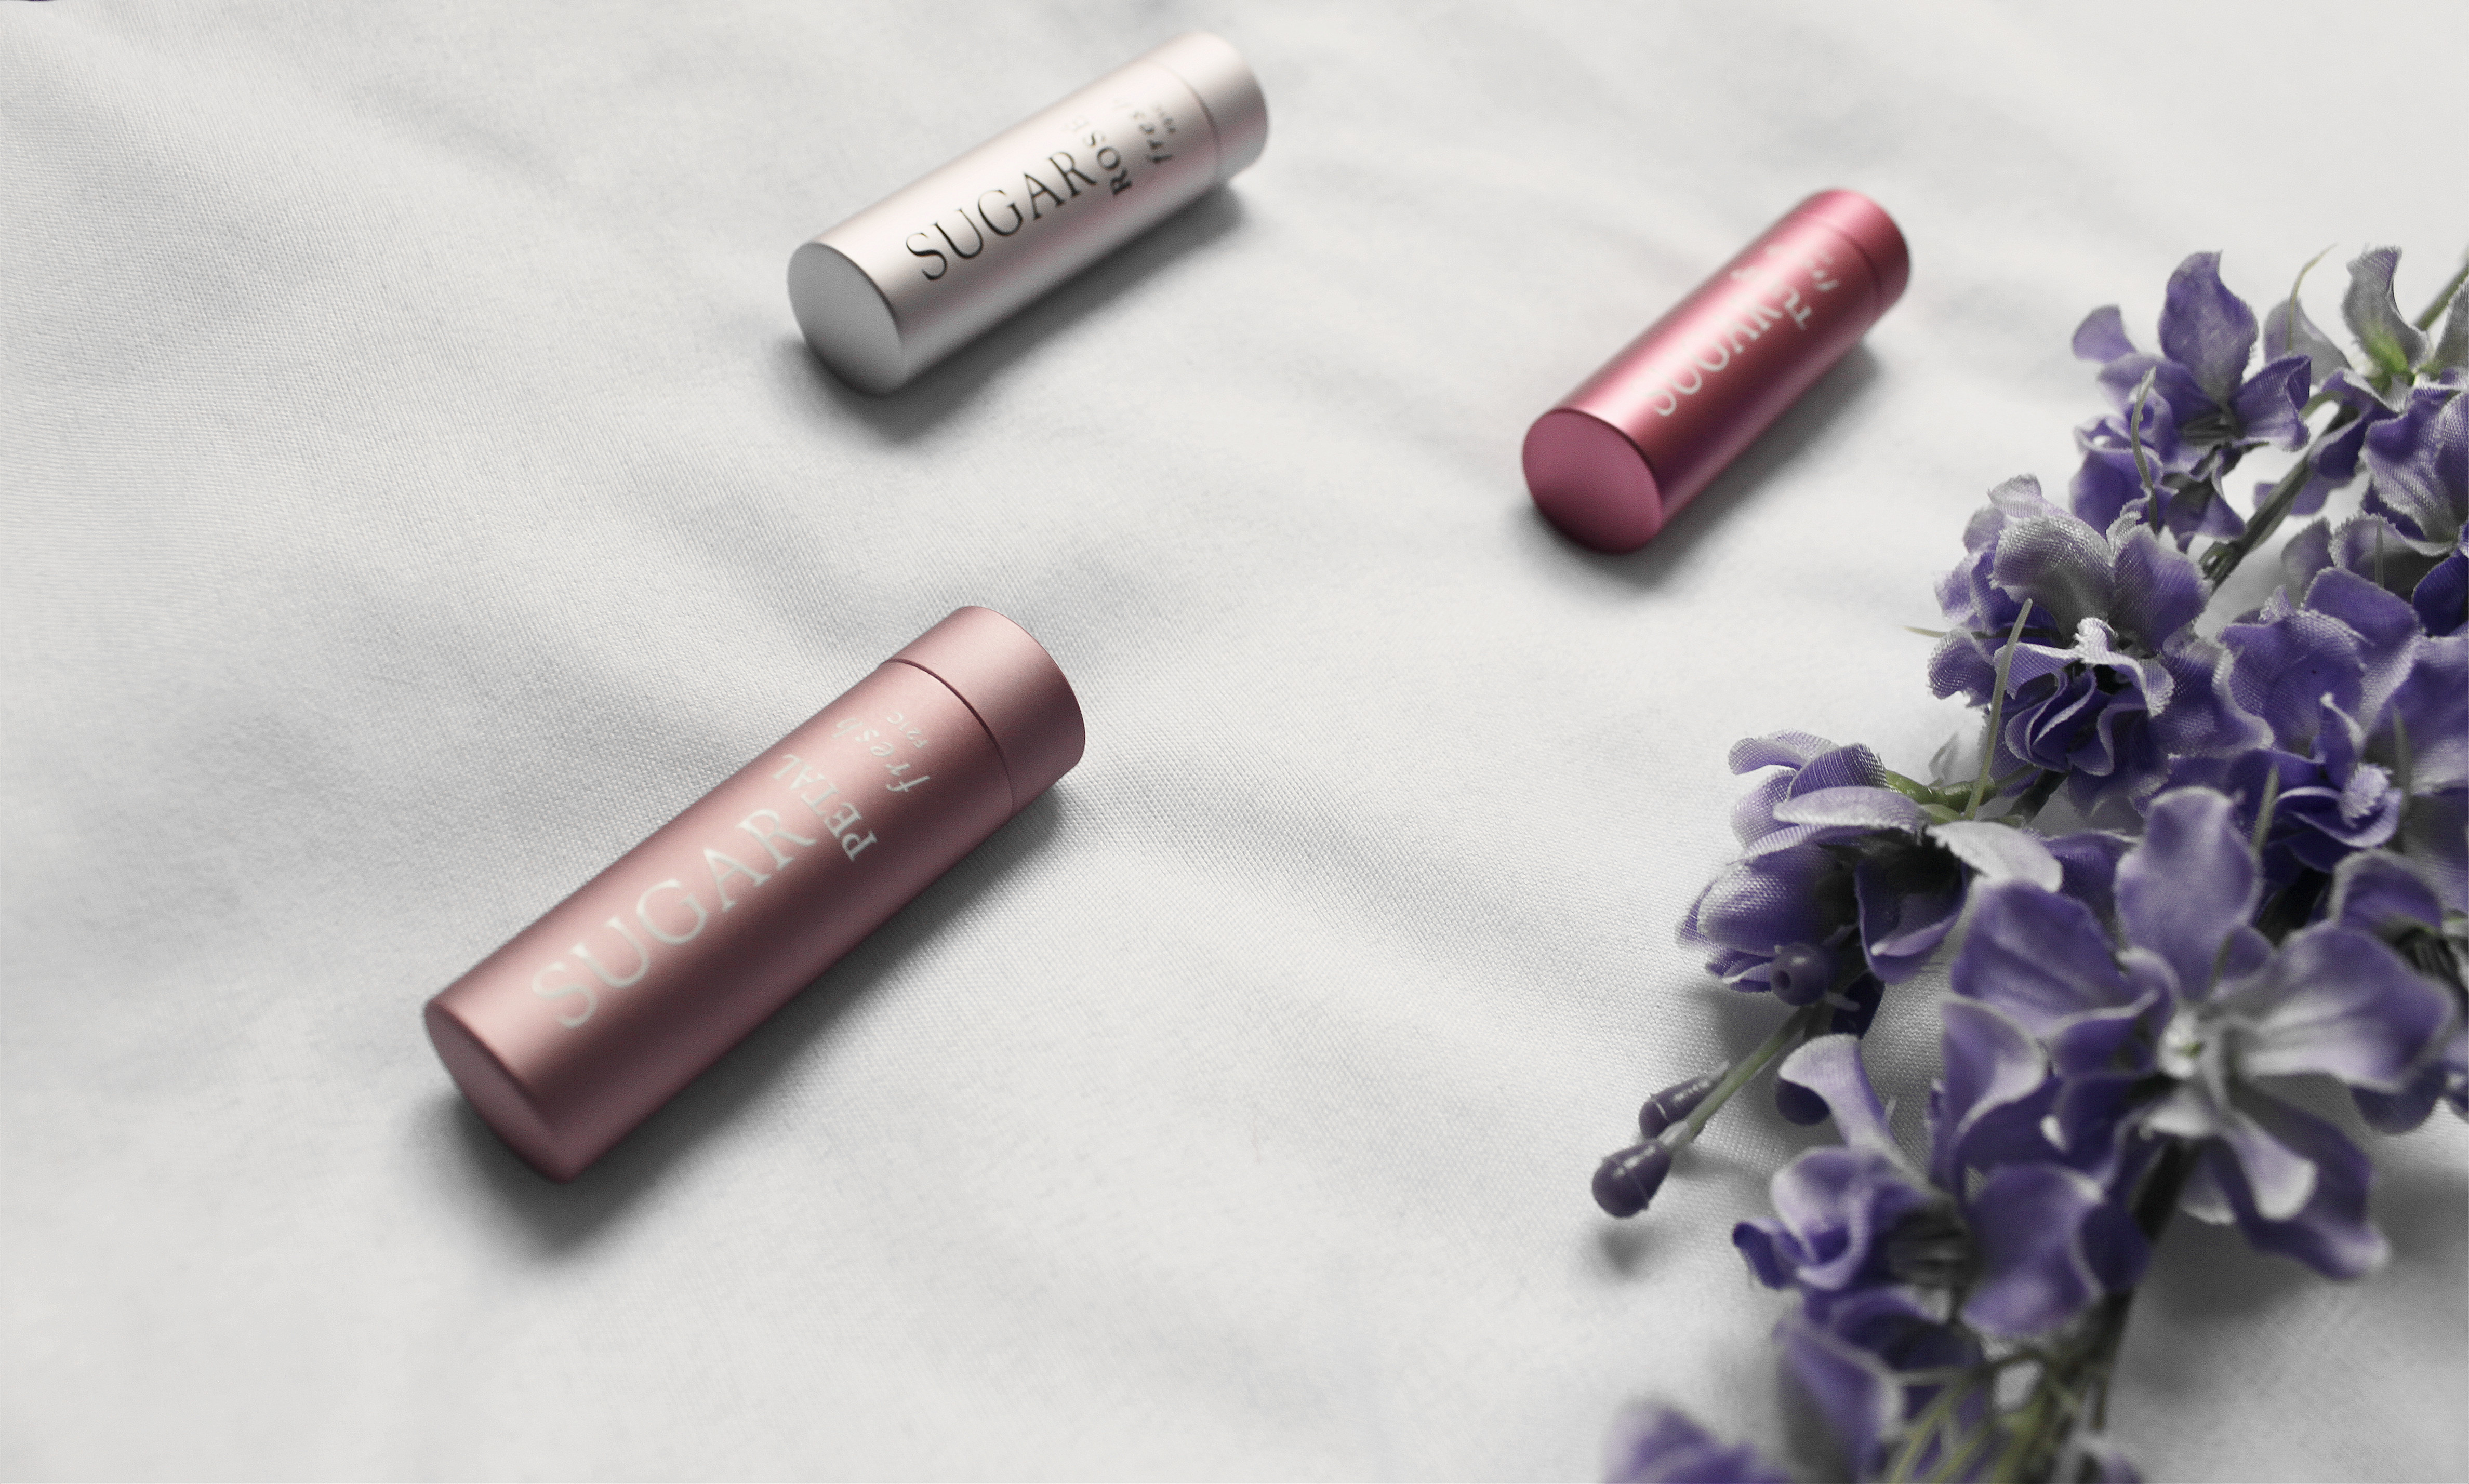 4982-beauty-makeup-skincare-sephora-vibrouge-cosmetics-olehenriksen-loccitane-fresh-clothestoyouuu-elizabeeetht-flatlay